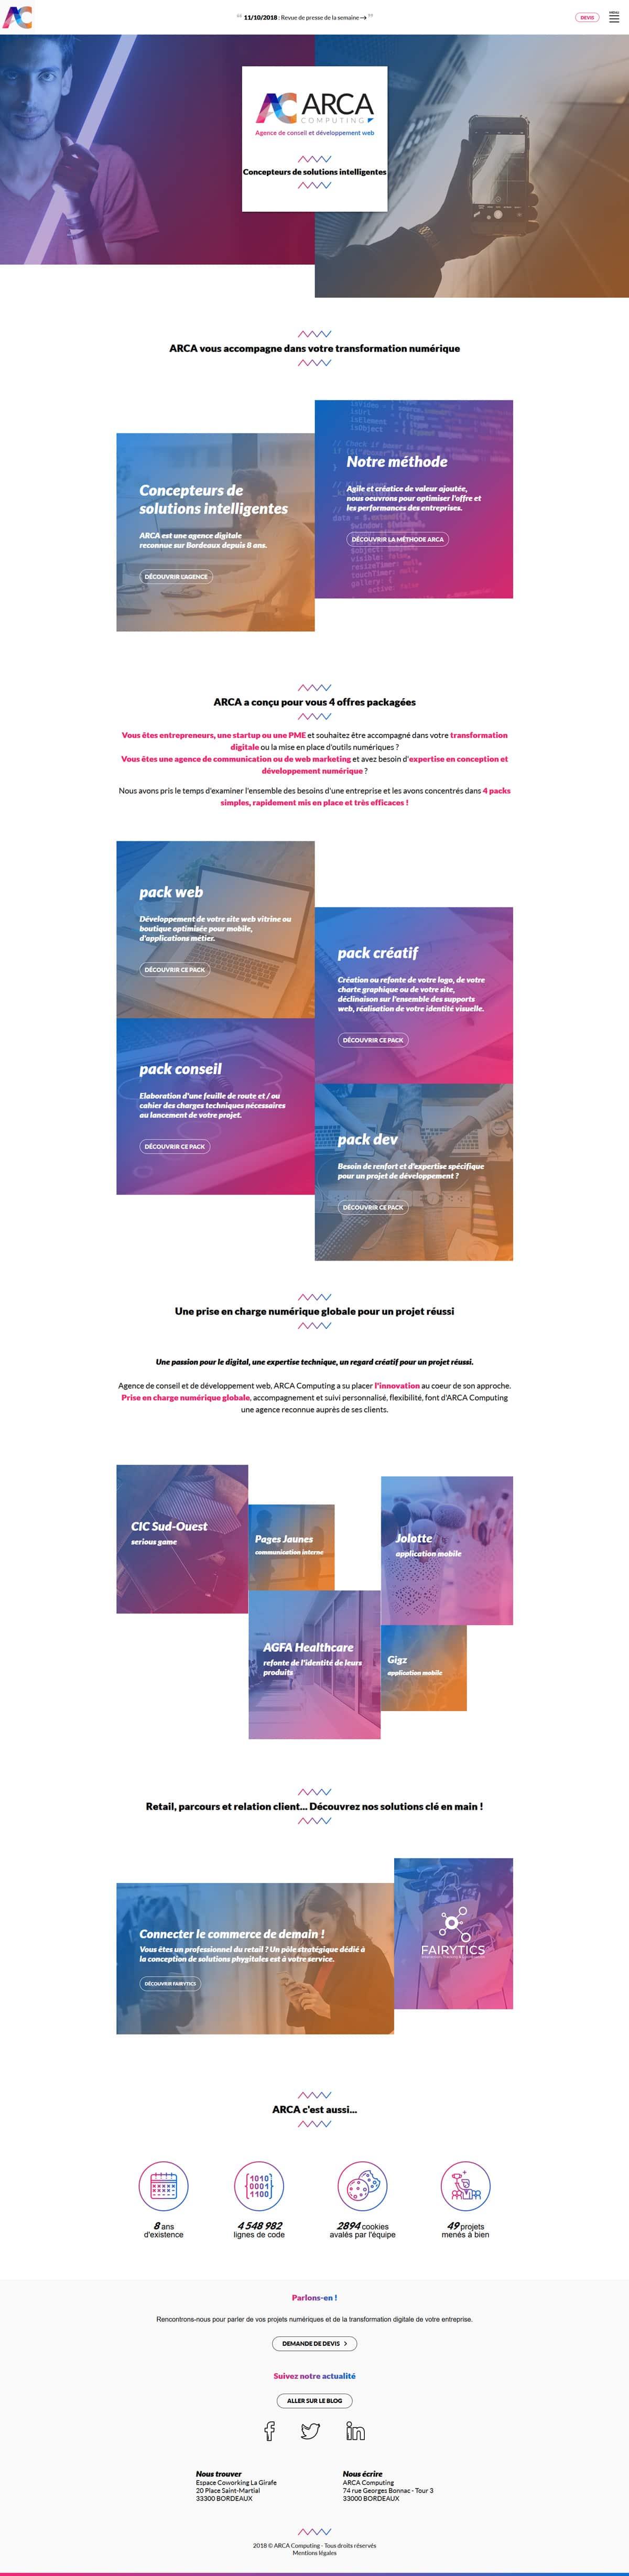 tendances UX/UI 2019